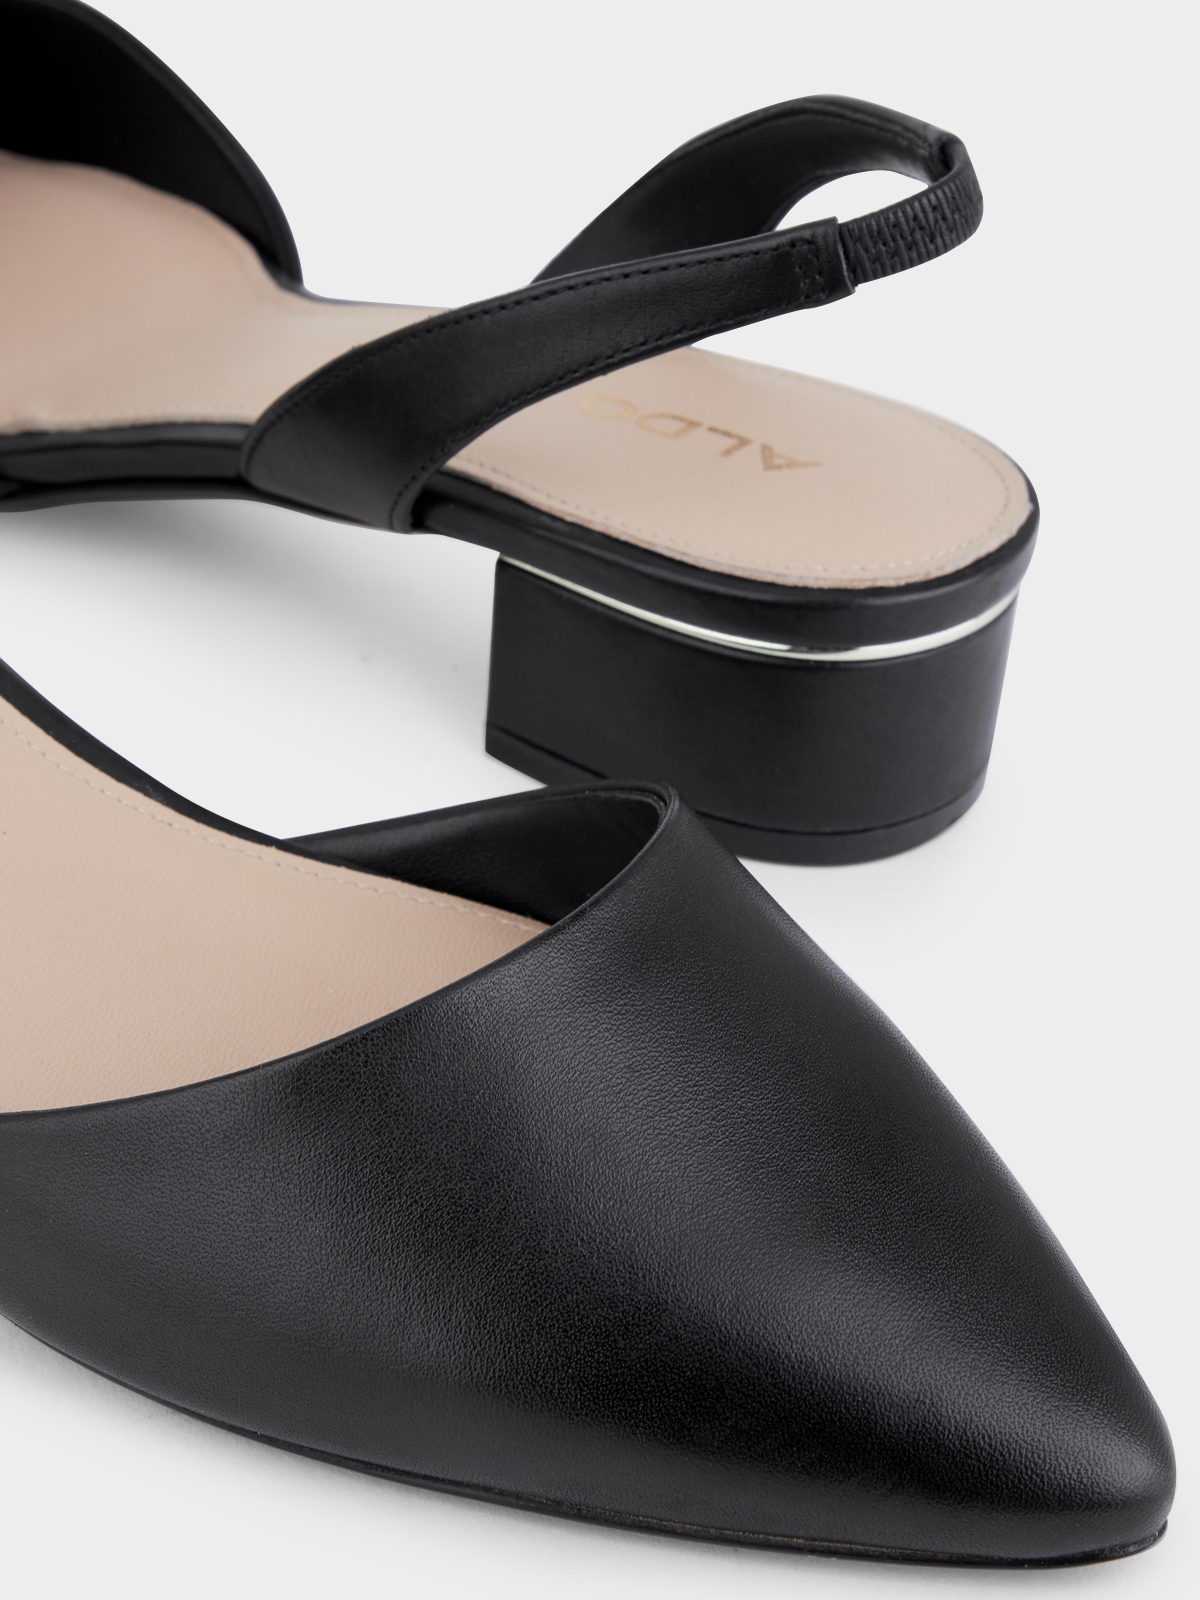 Aldo Anathana Muel Heels Black